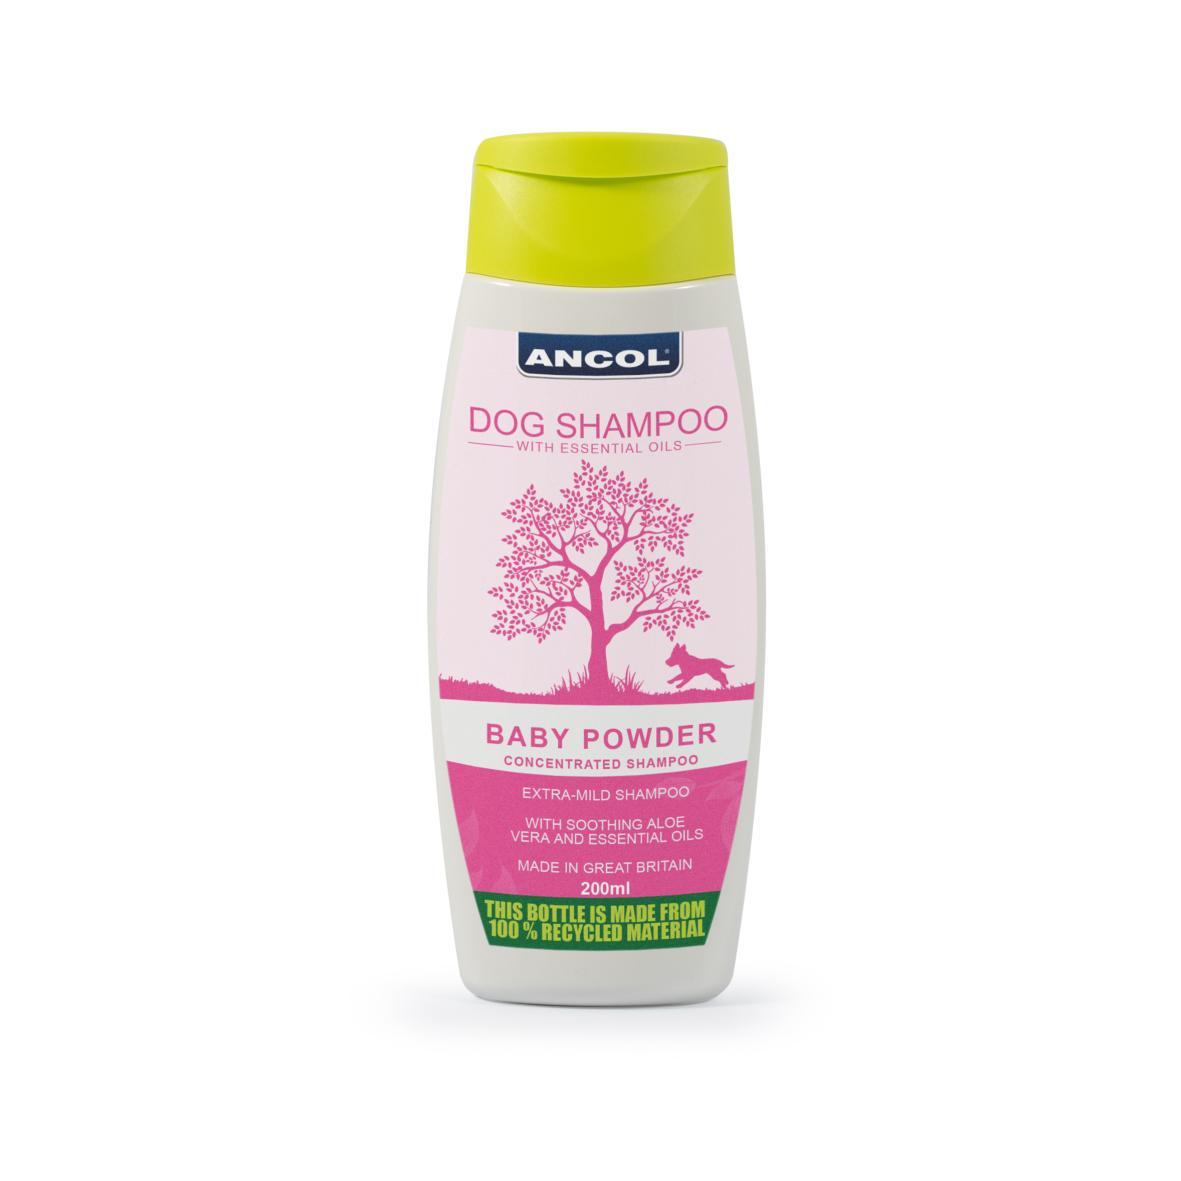 ANCOL Baby Powder Dog Shampoo BB 200ml